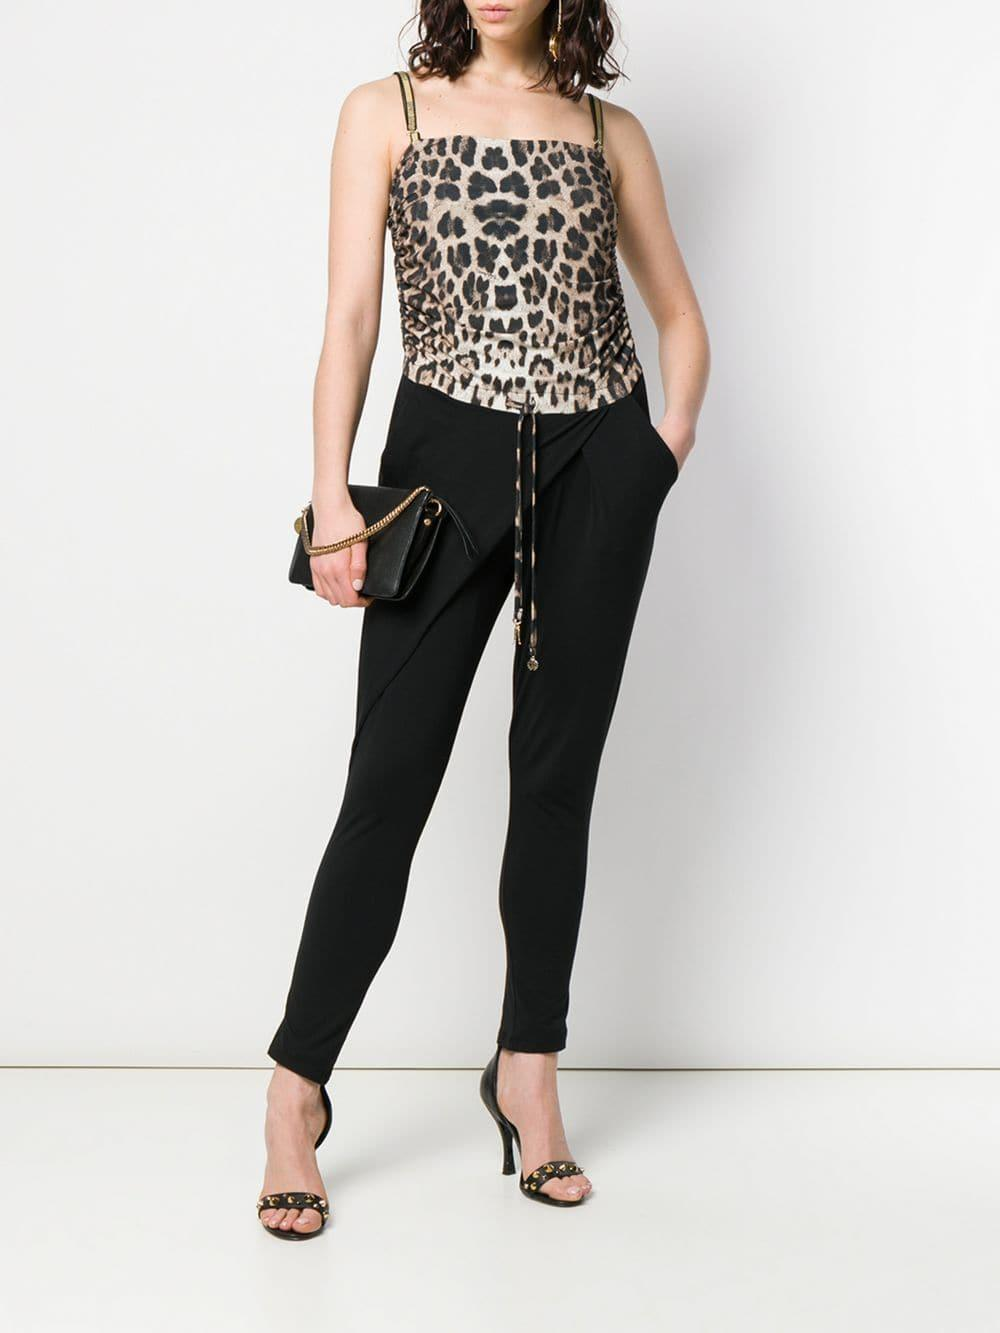 c14d50ecf4 Lyst - Roberto Cavalli Leopard-print Jumpsuit in Black